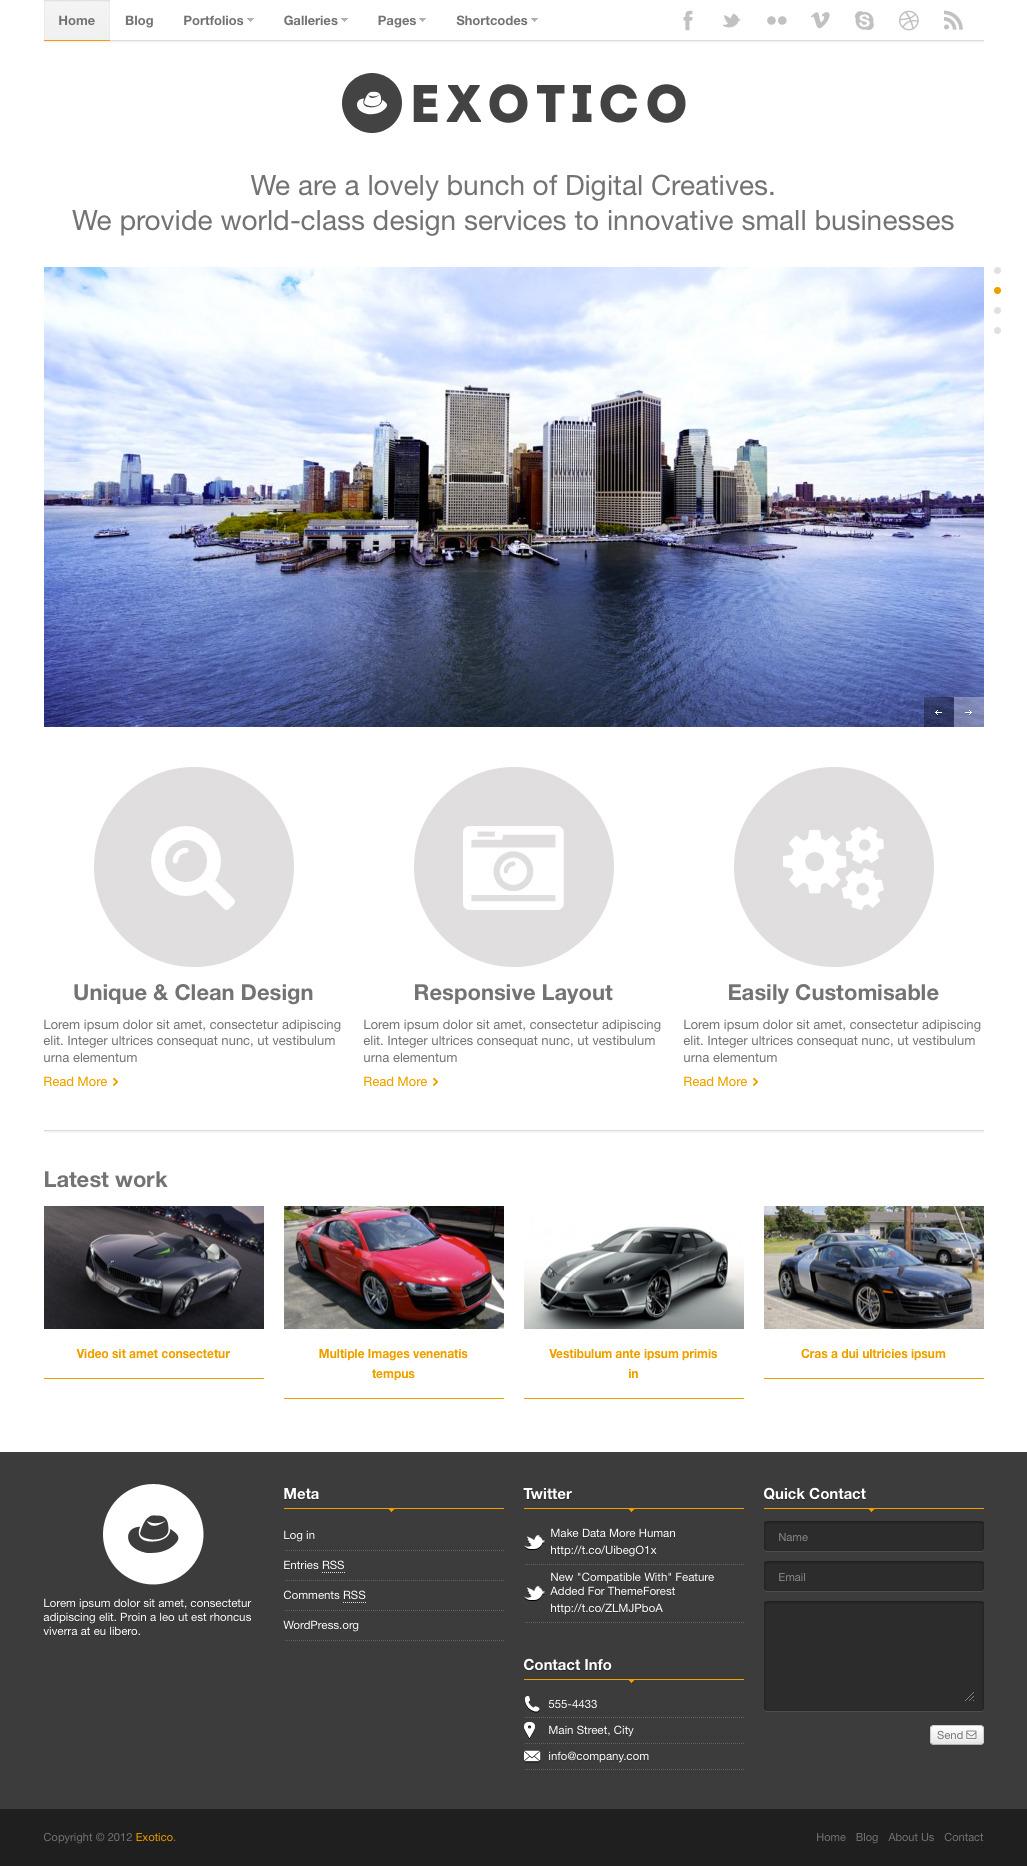 Exotico - Responsive WordPress Theme (1200p) - Portfolio Unlimited Color Elements, 30+ Shortcodes, iPhone, iPad, Portfolio and Slider Custom Post Types, AJAX Contact Form, Video Documentation, Sidebar Generator, Responsive, Video, Image